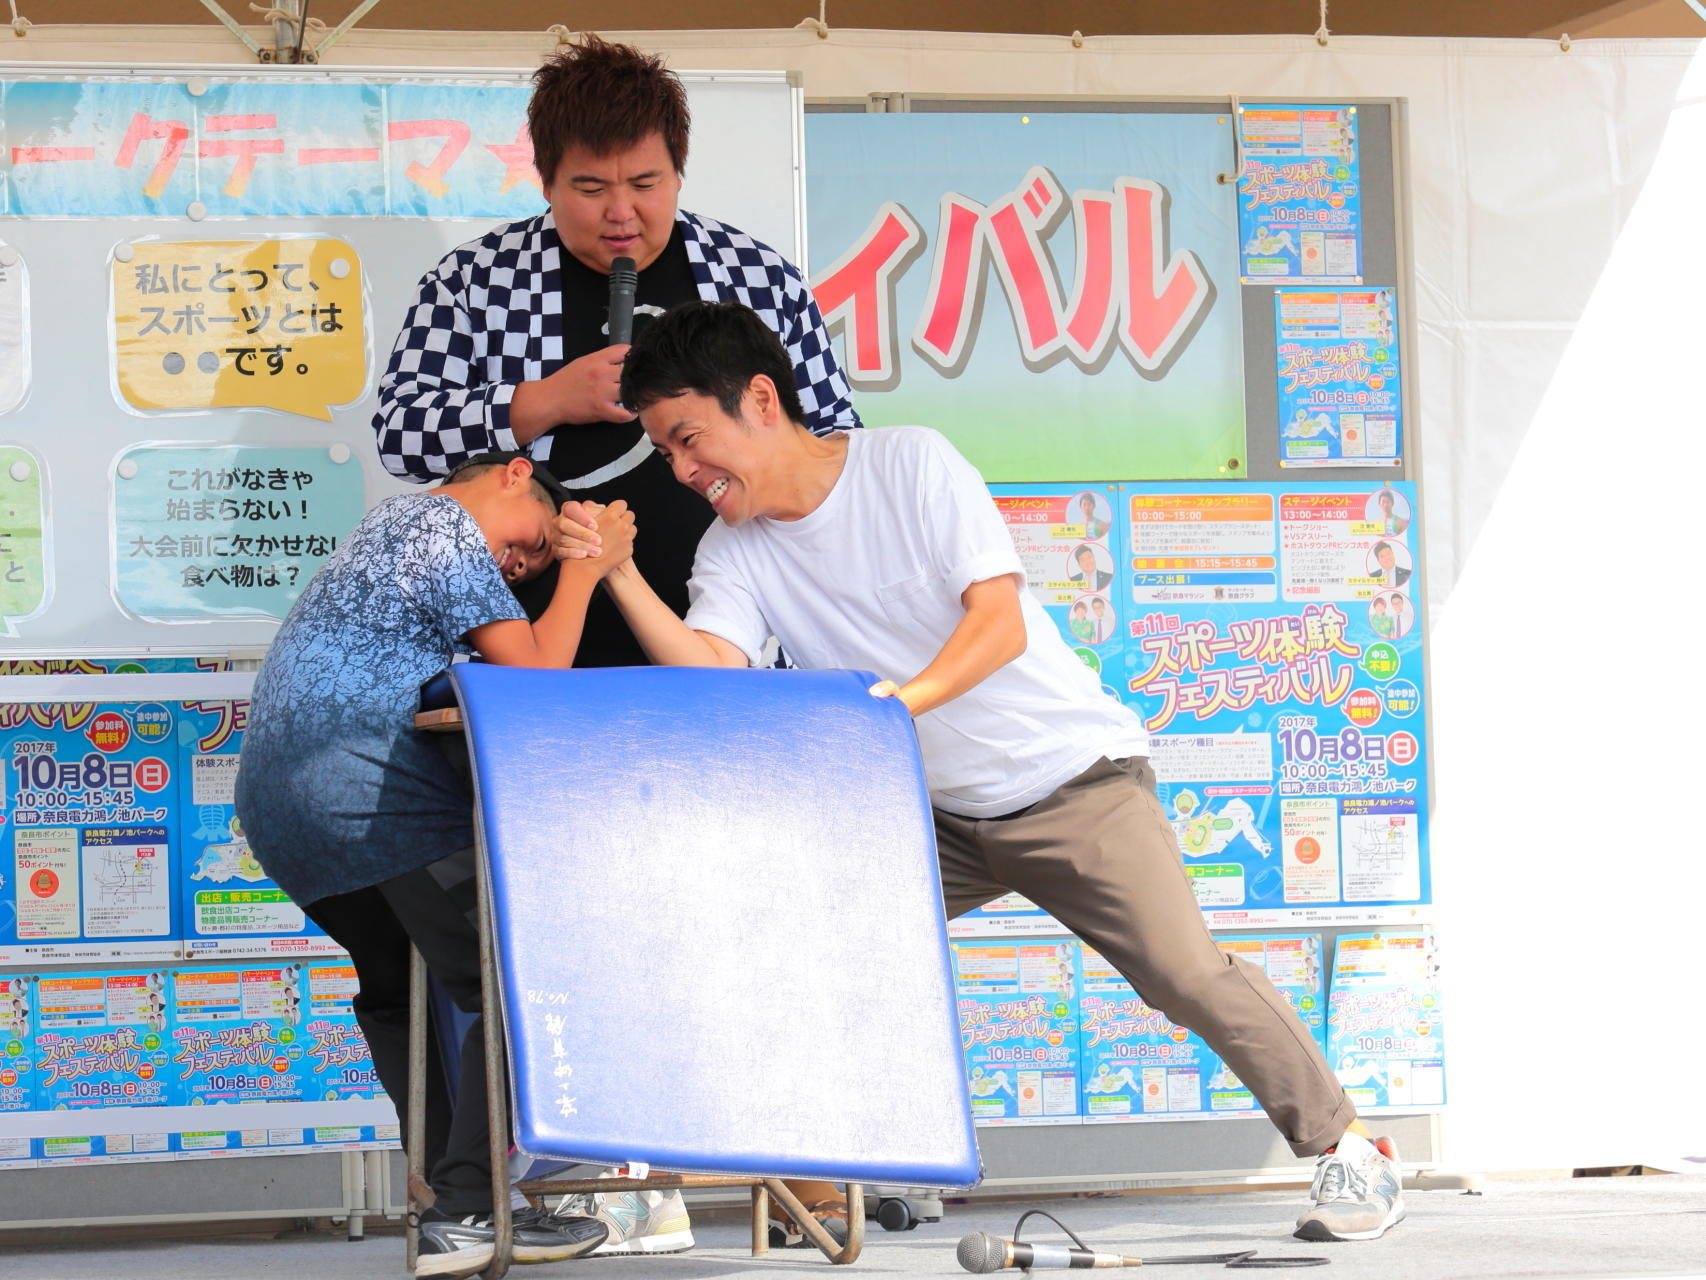 http://news.yoshimoto.co.jp/20171013012329-0b417184754967def801ebaf9ea9eecb3a3924f0.jpg